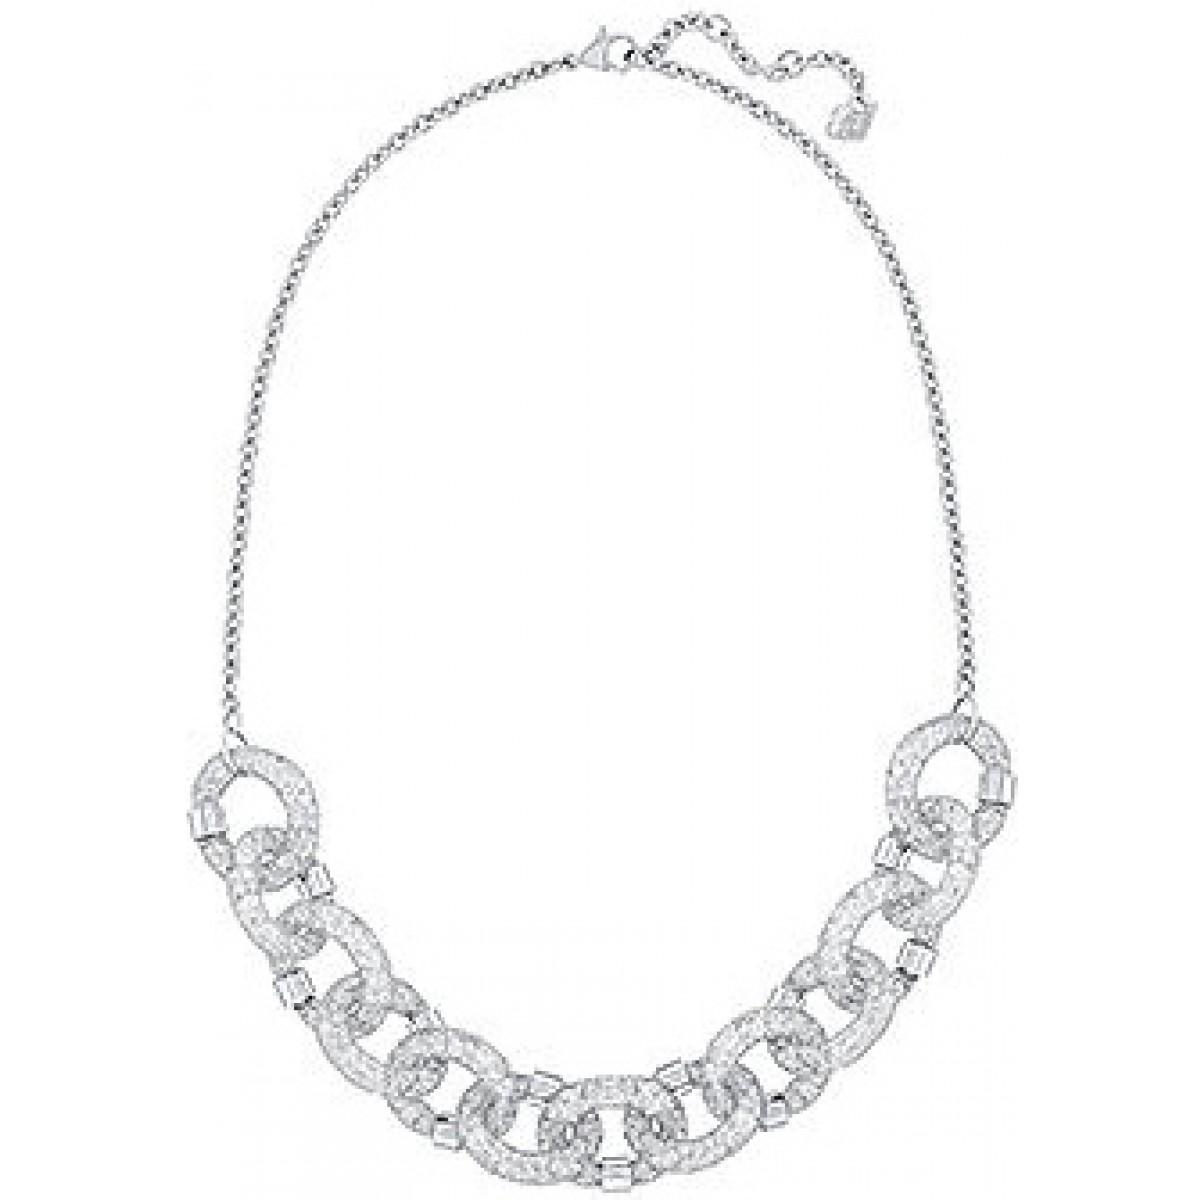 3be2f555aa41 swarovski stardust deluxe link necklace.jpg